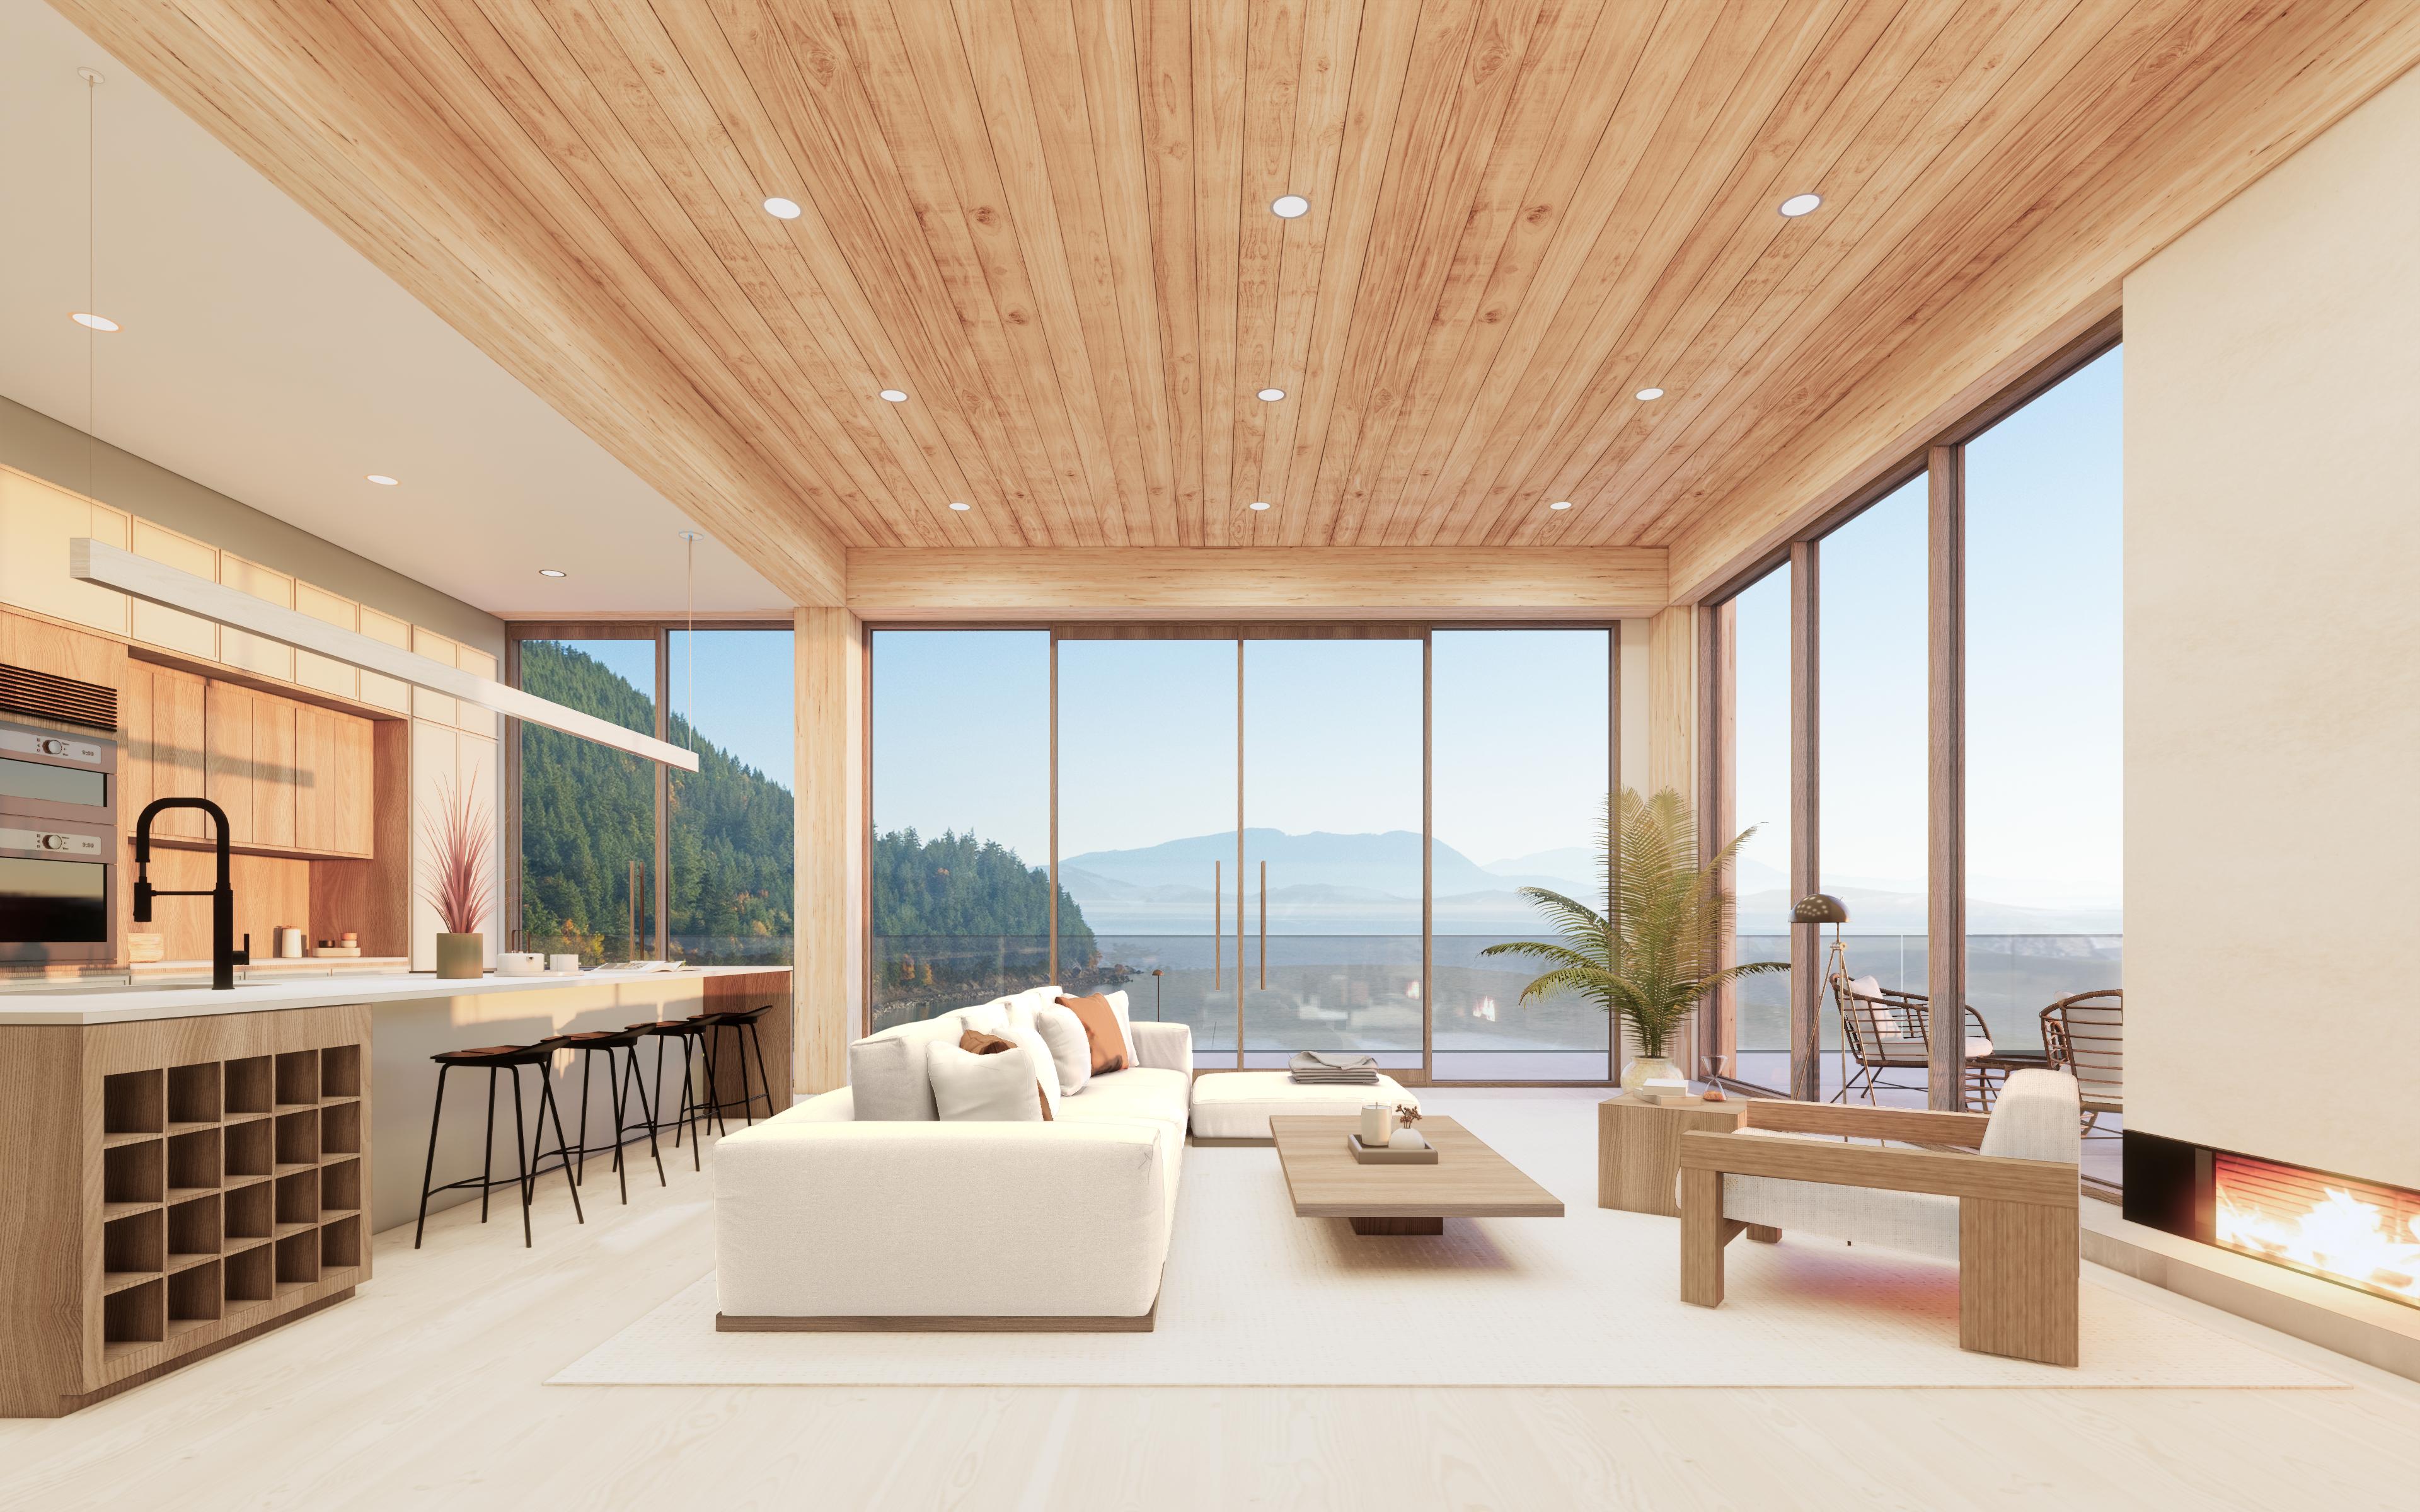 Sooke - Interior Concept Rendering